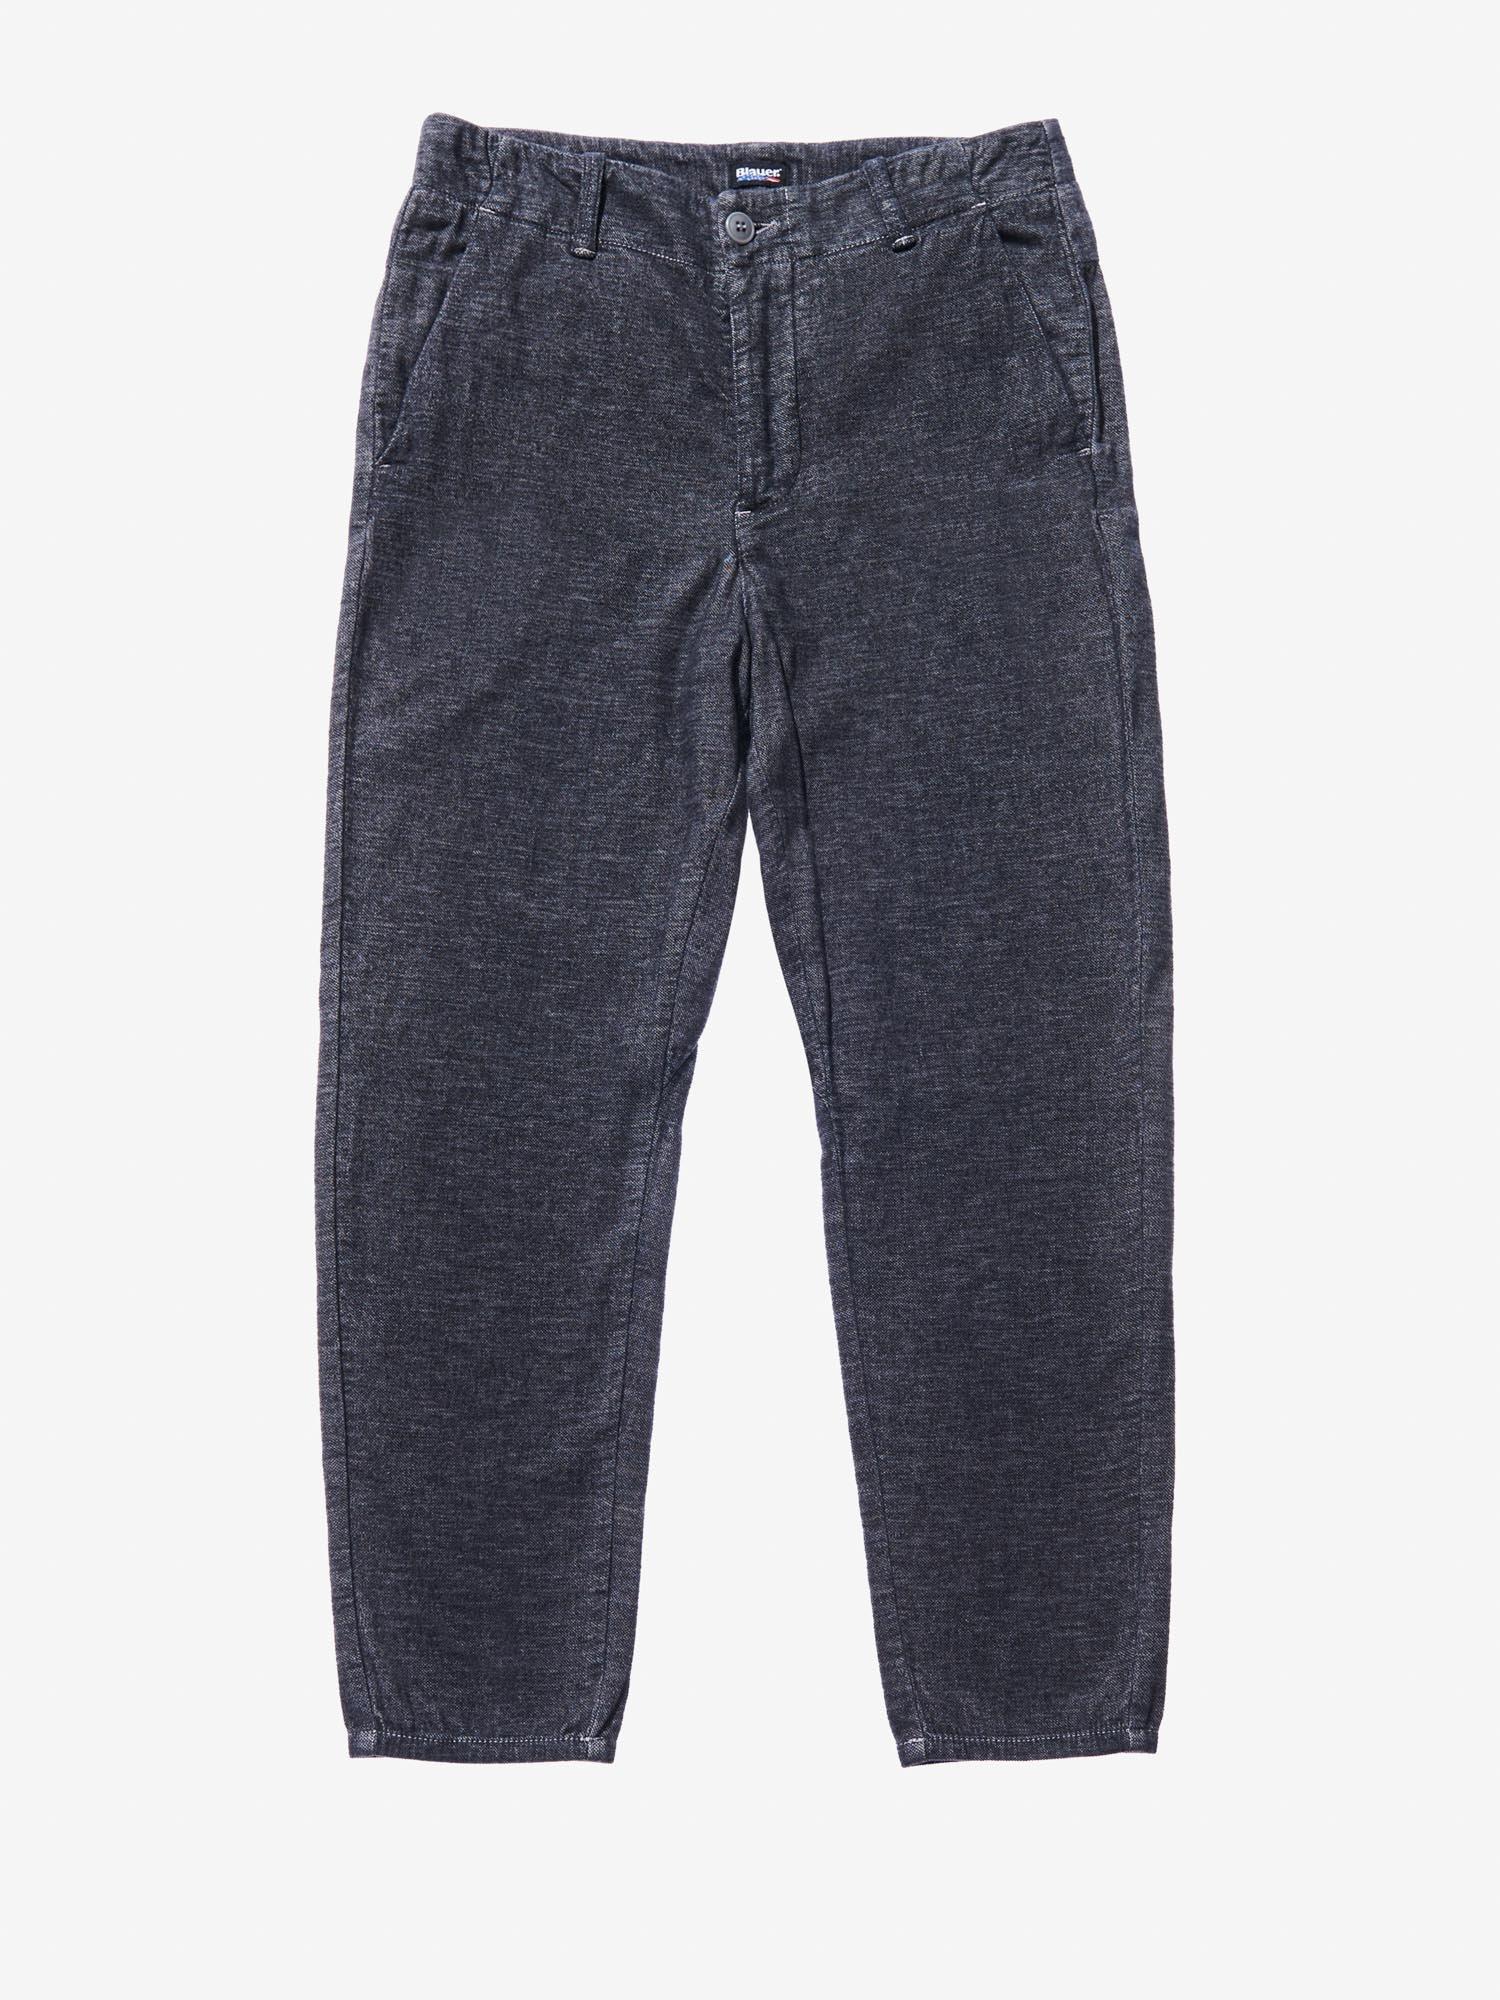 Blauer - MELANGE PANTS - Cloudy Grey - Blauer